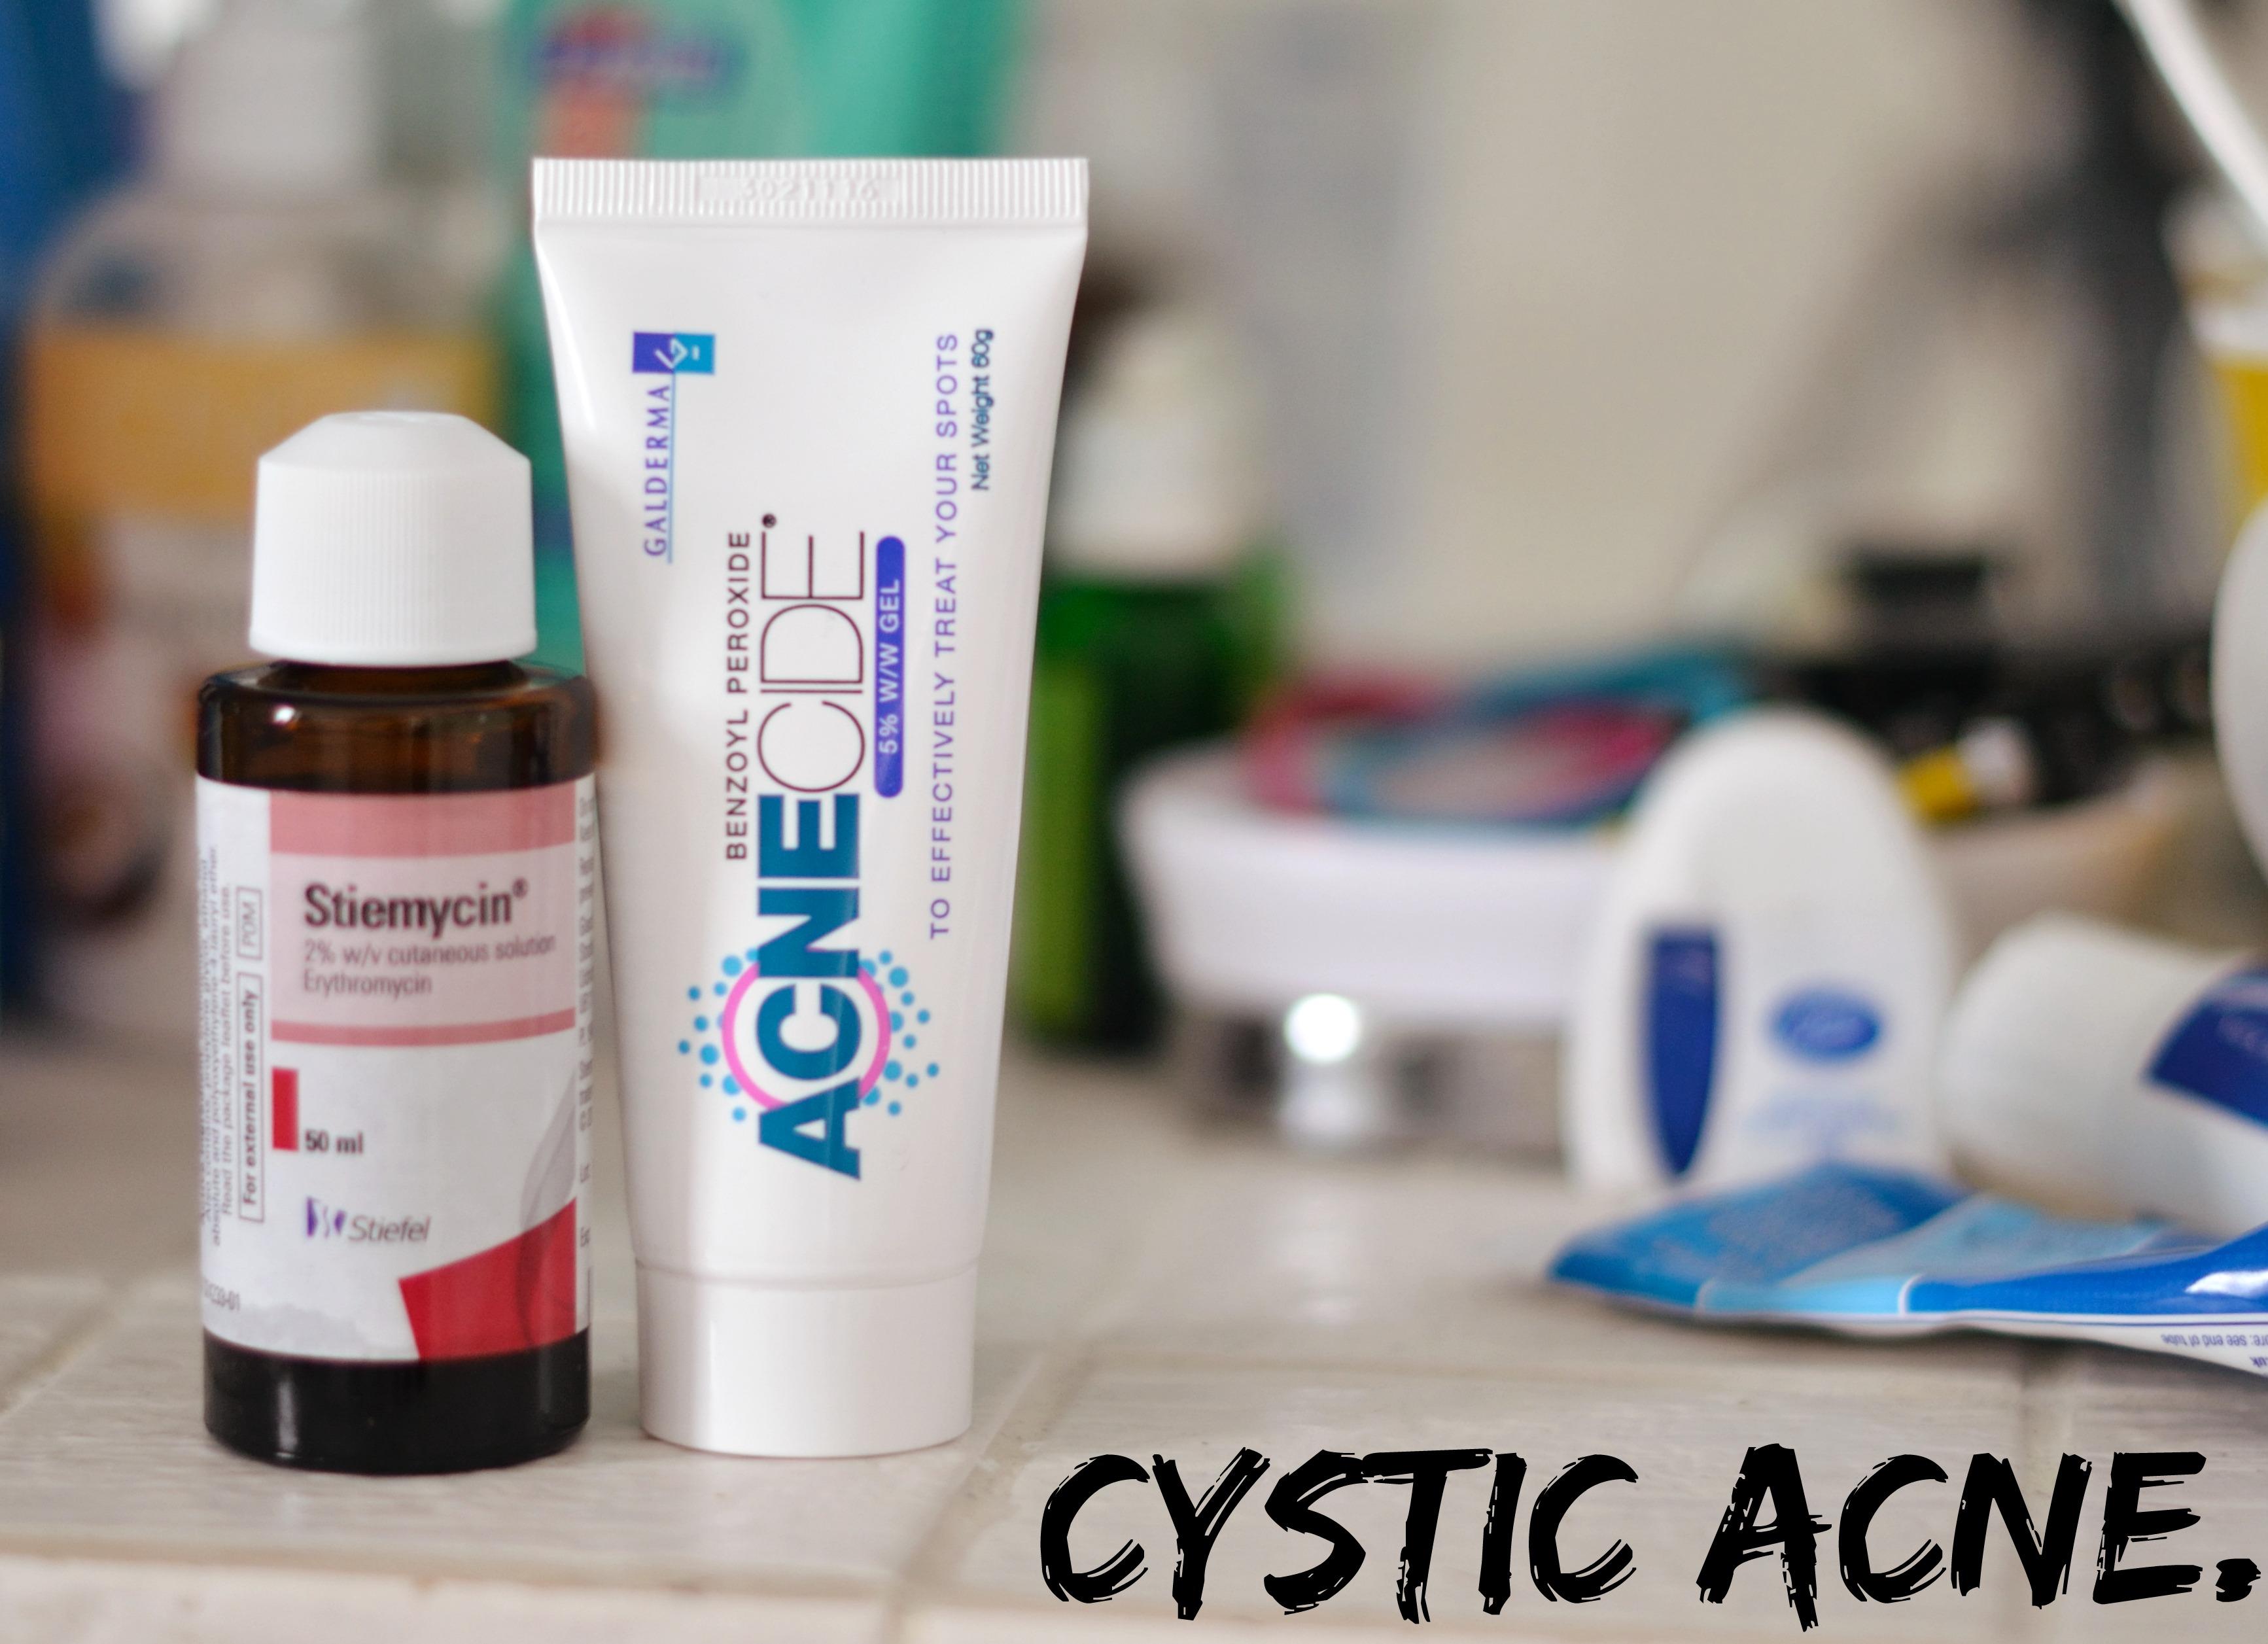 Stiemycin & Acnecide for Cystic Acne.